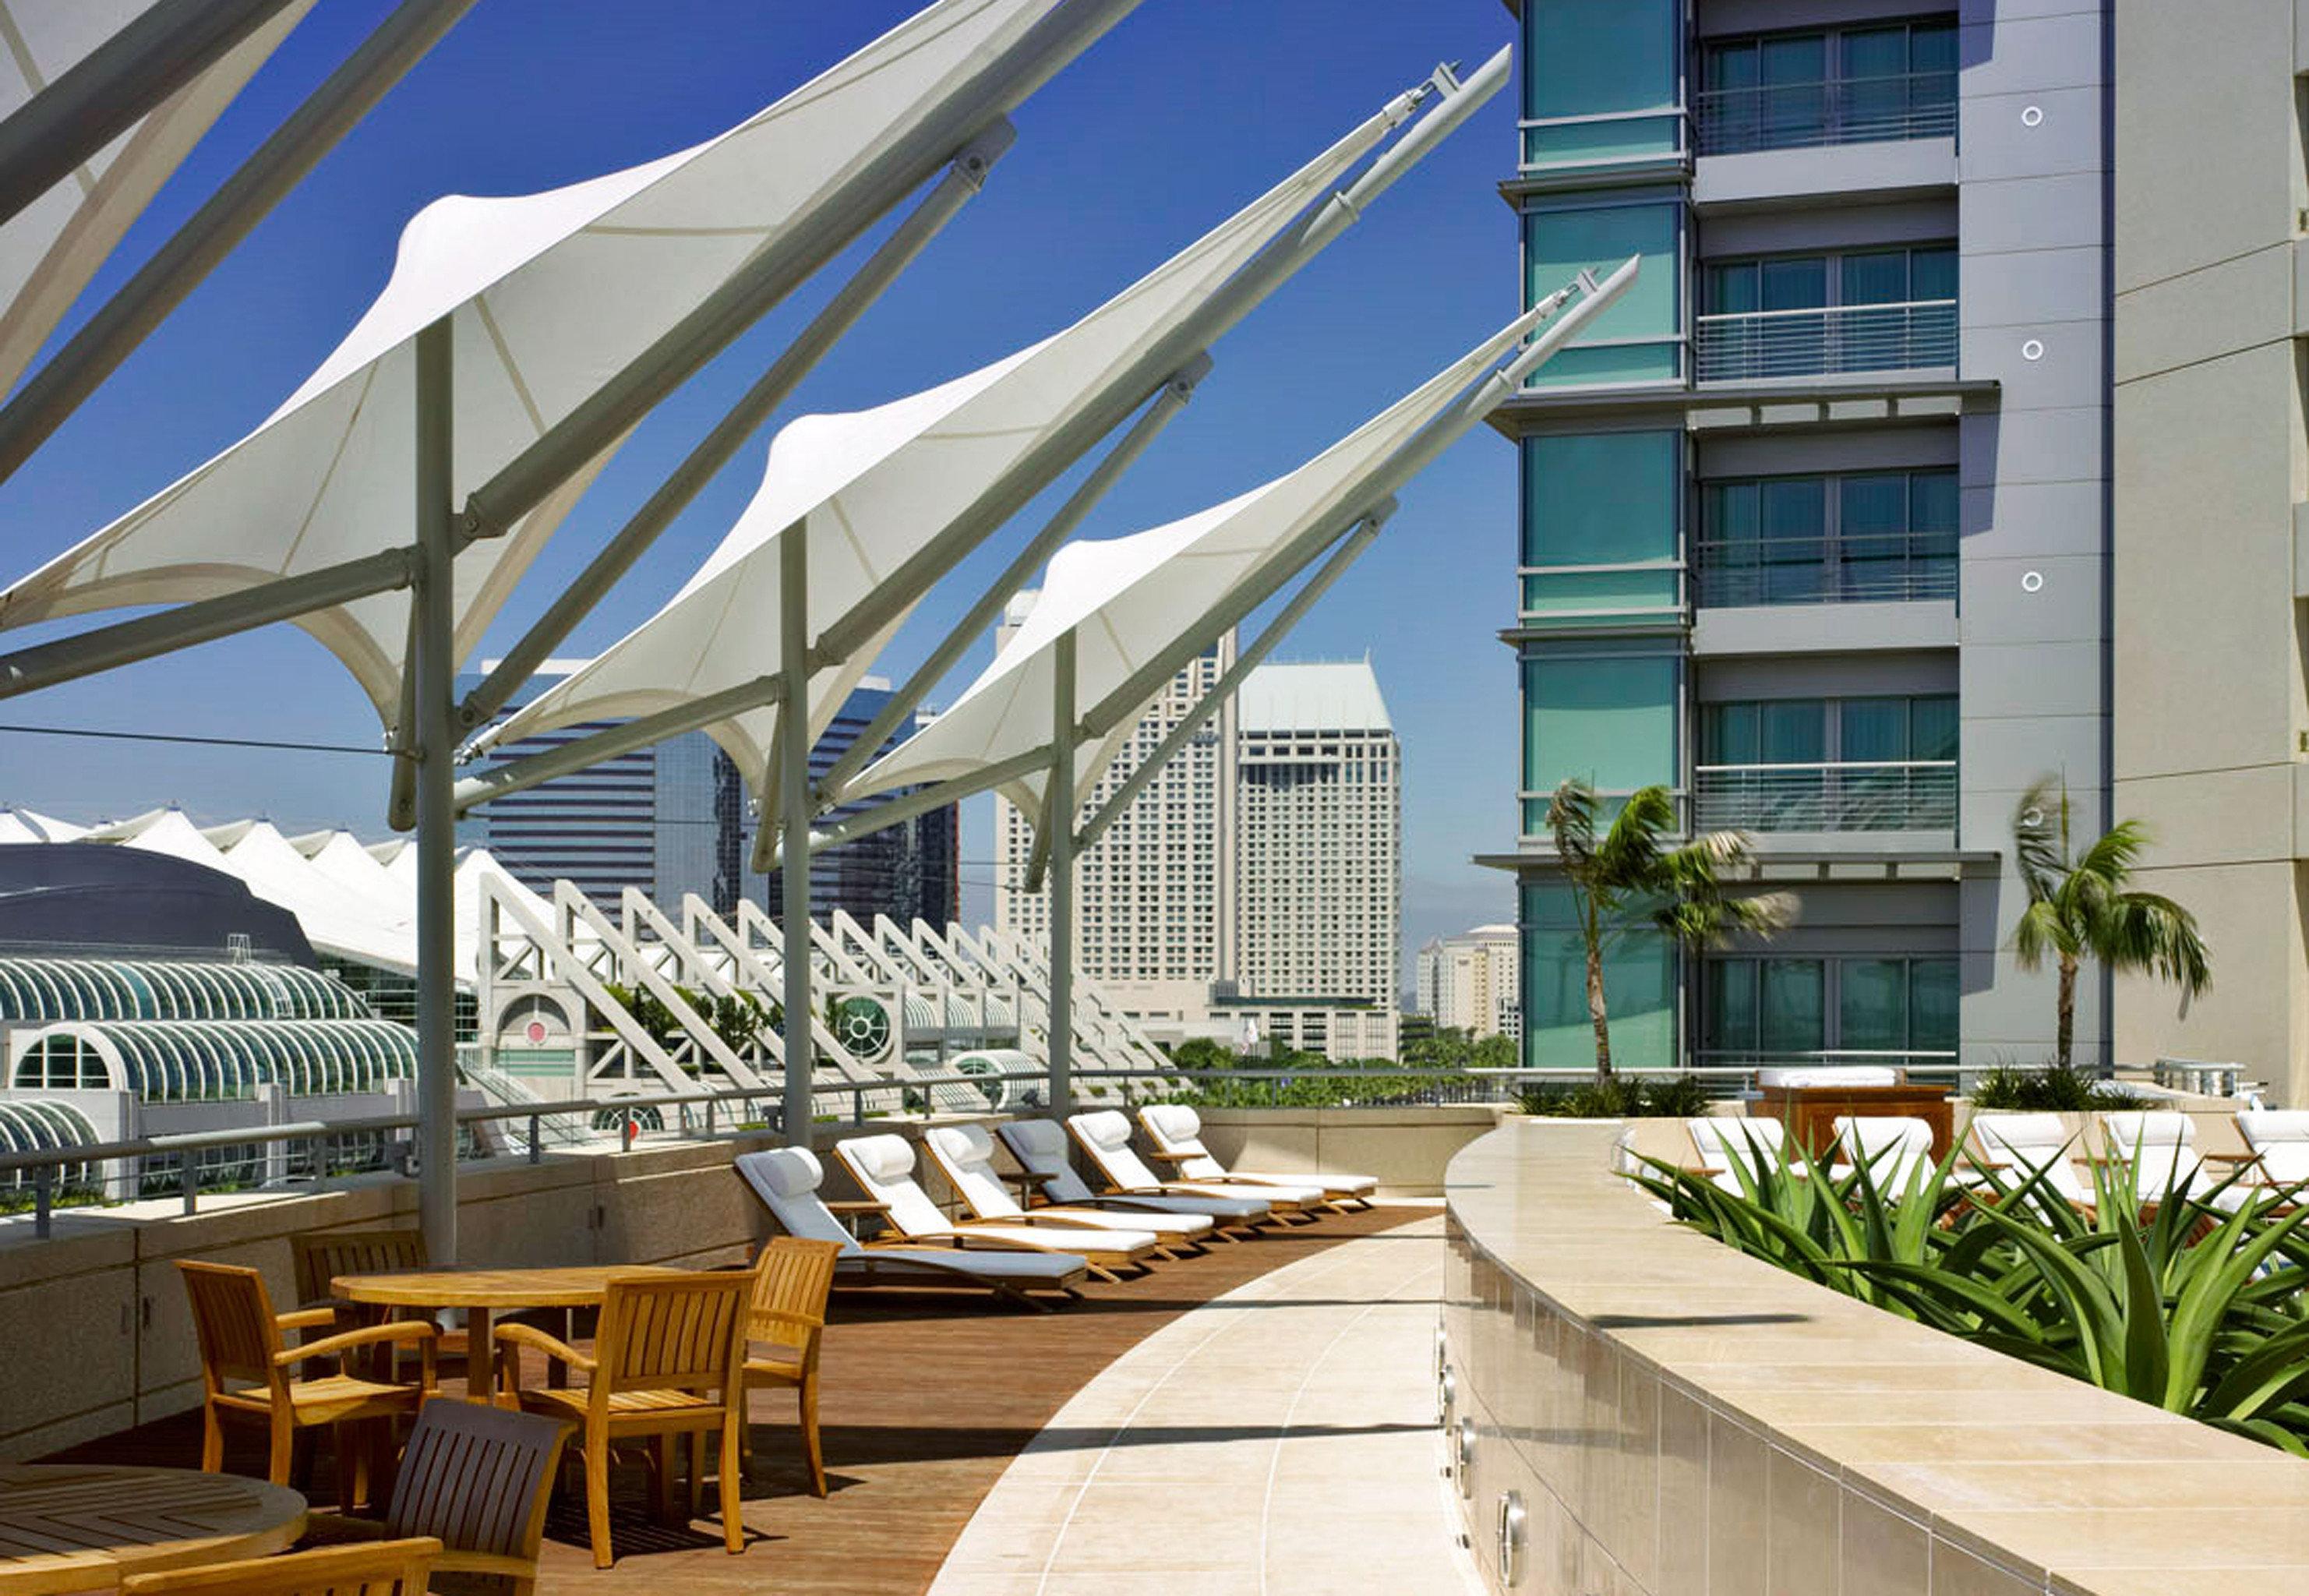 Lounge Luxury Modern Scenic views building Architecture condominium Resort plaza convention center walkway